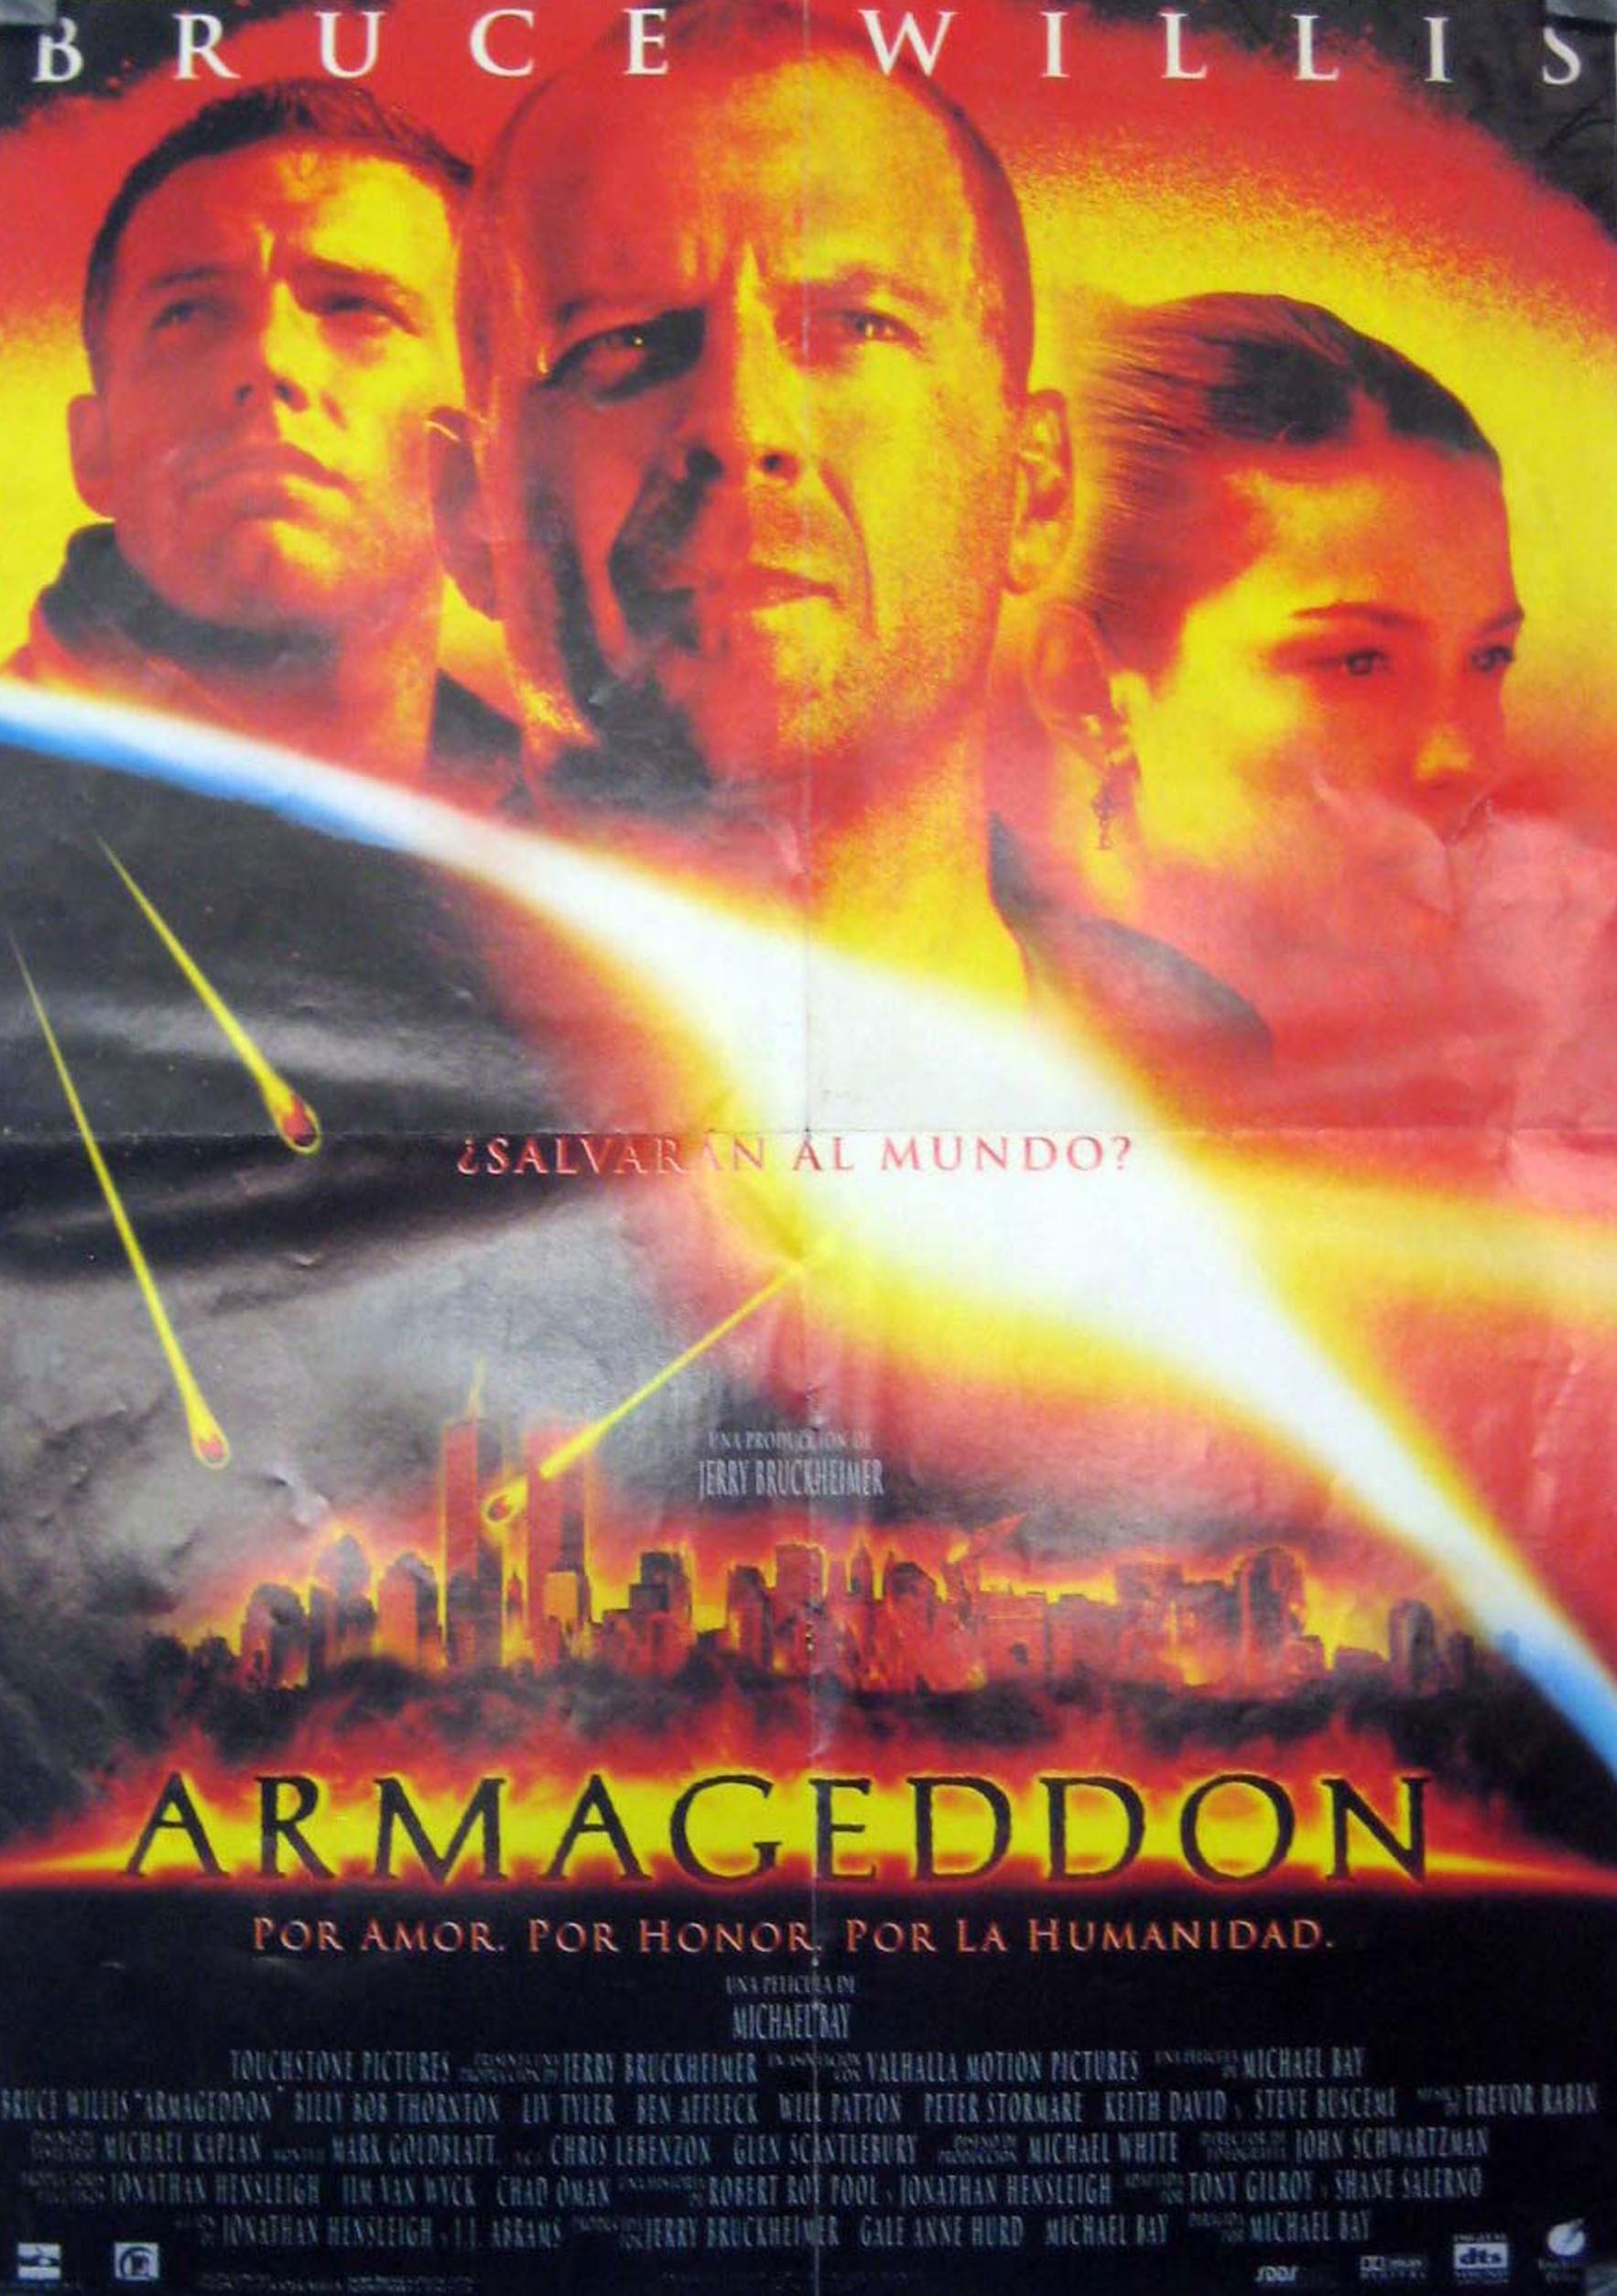 Armageddon 1998 Photo Gallery Imdb